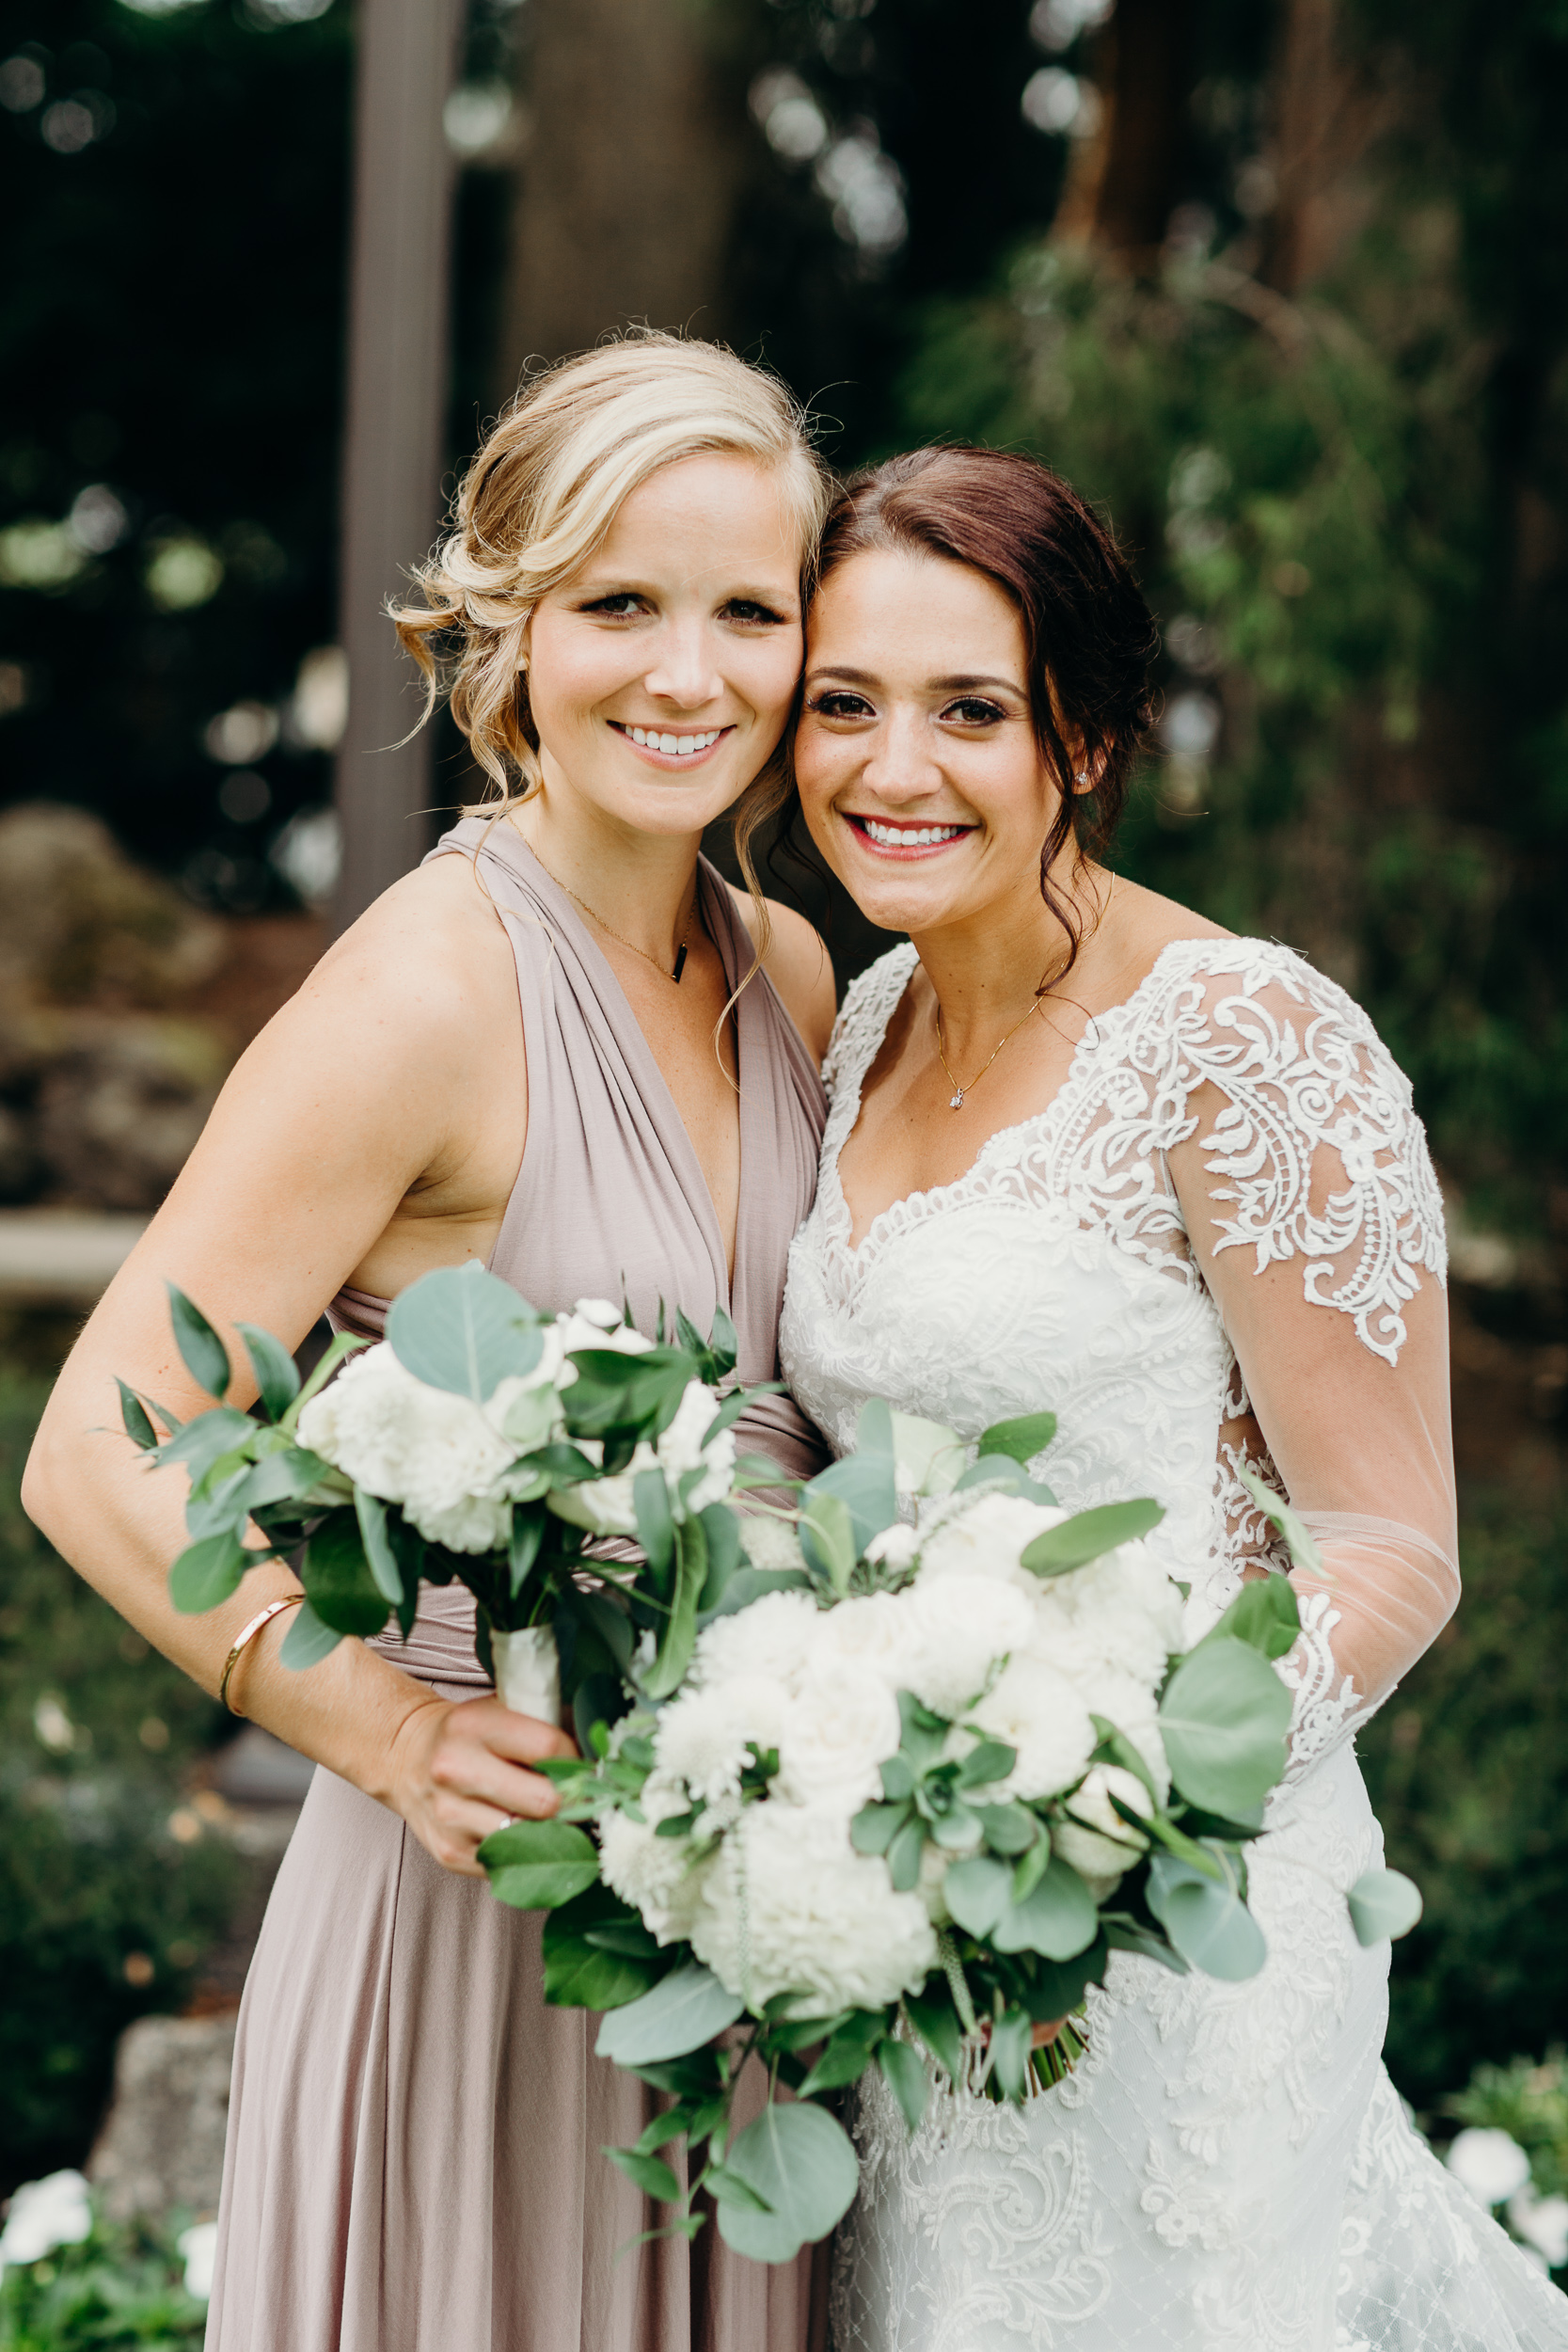 20170820 Savanna & Vince Wedding 1869.jpg